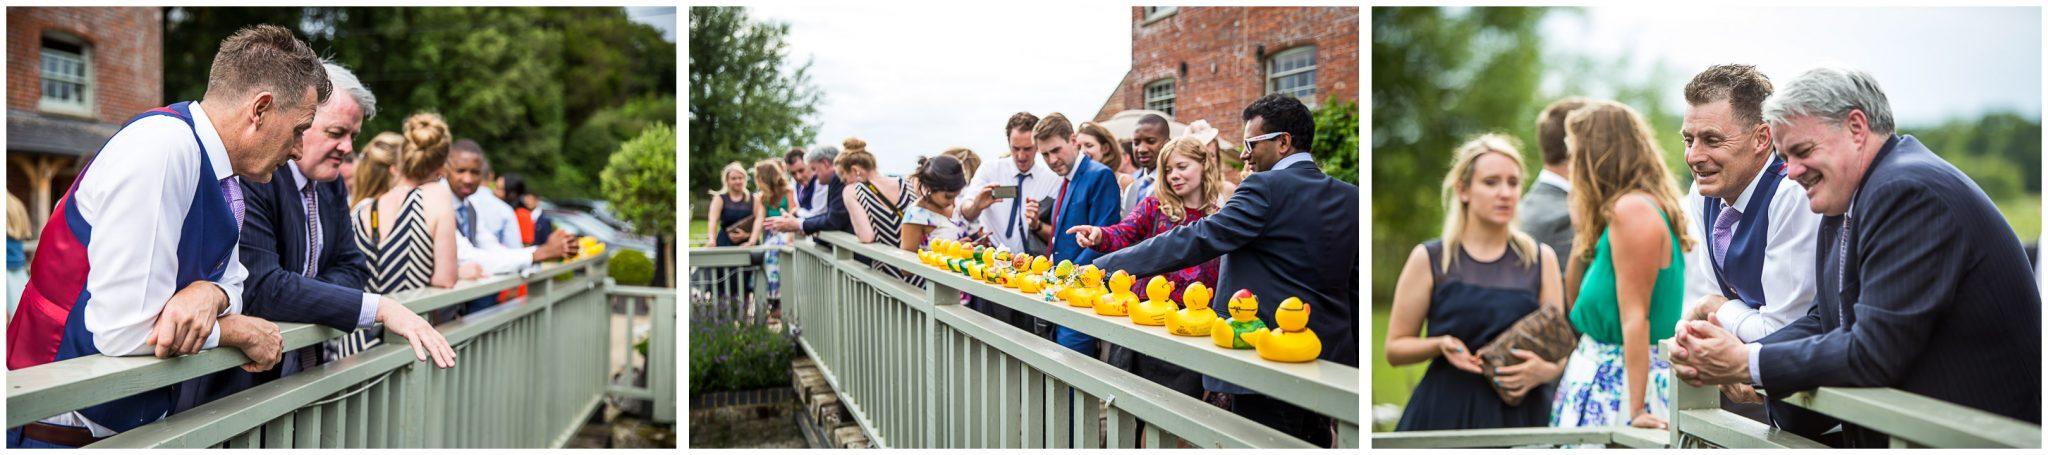 Sopley Mill Summer wedding duck race